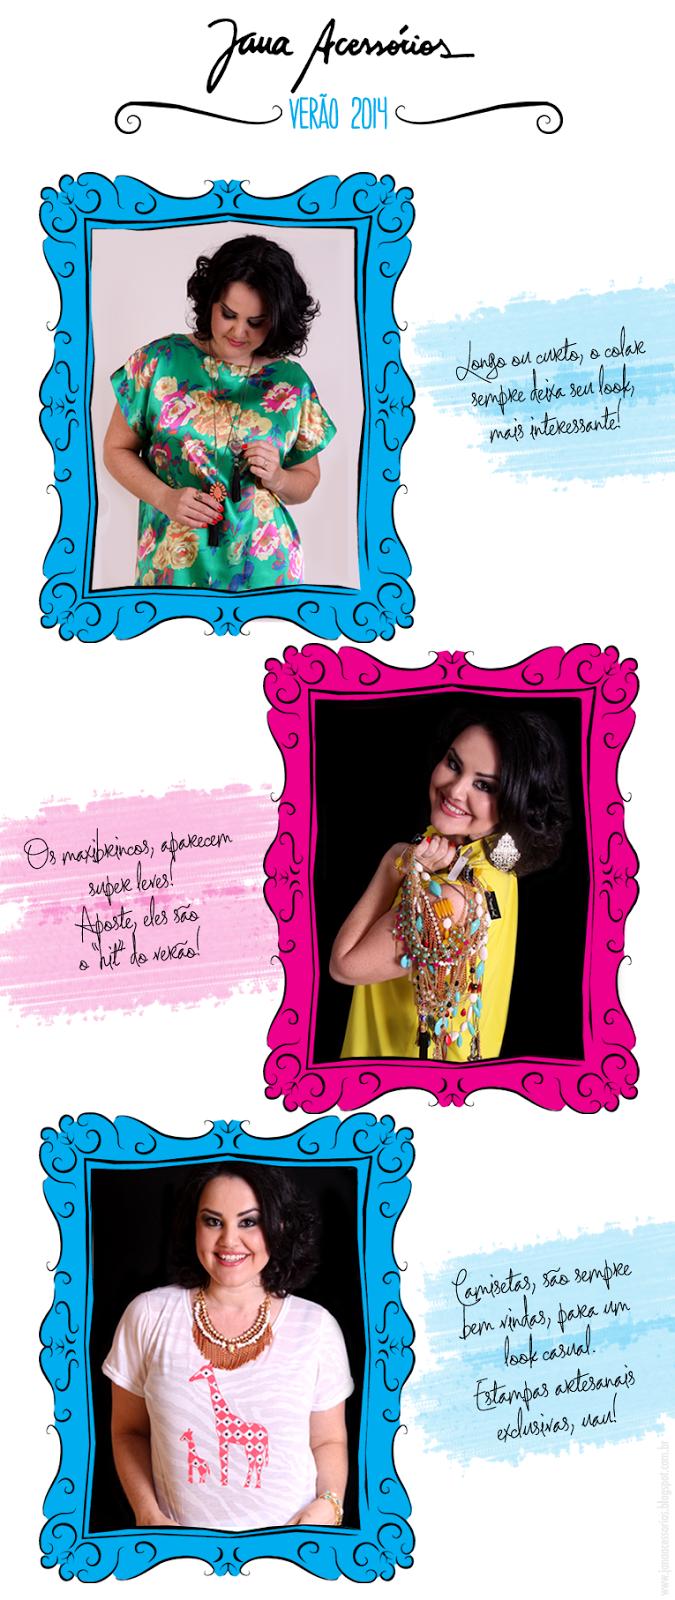 Joinville, Acessórios, Fashion, Moda, Estilo, Style